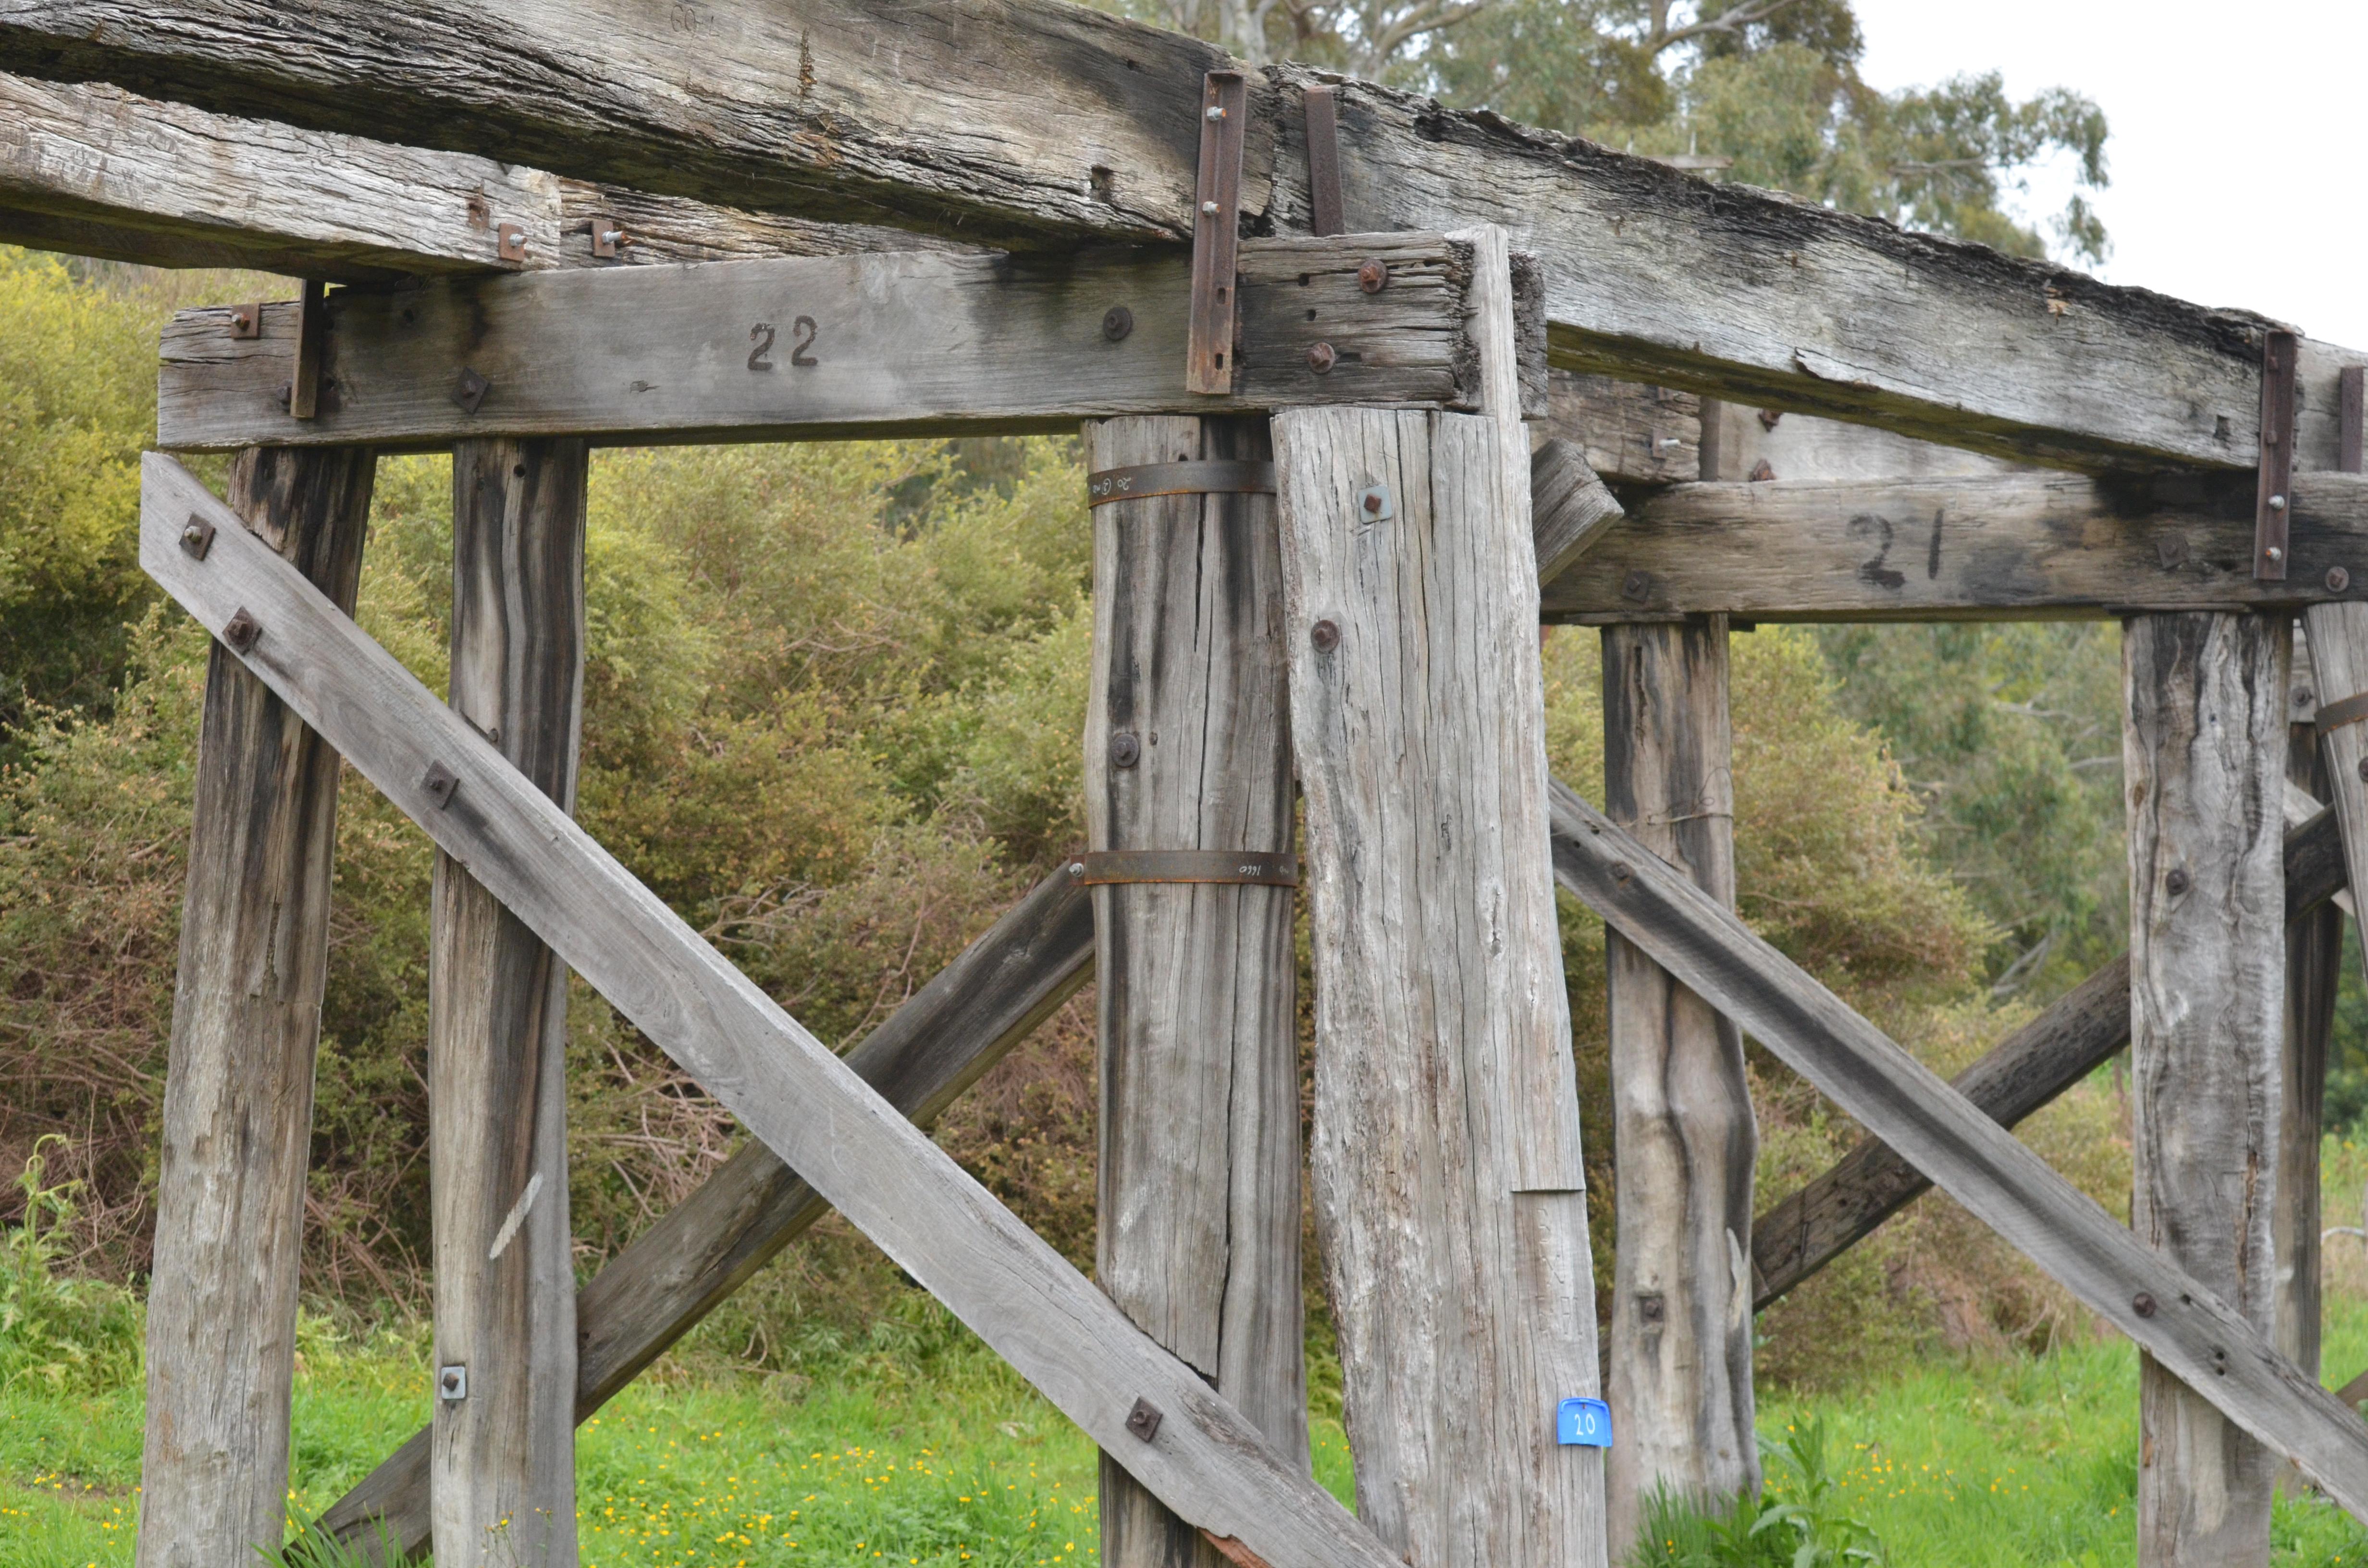 Bridge timbers, Koonwarra